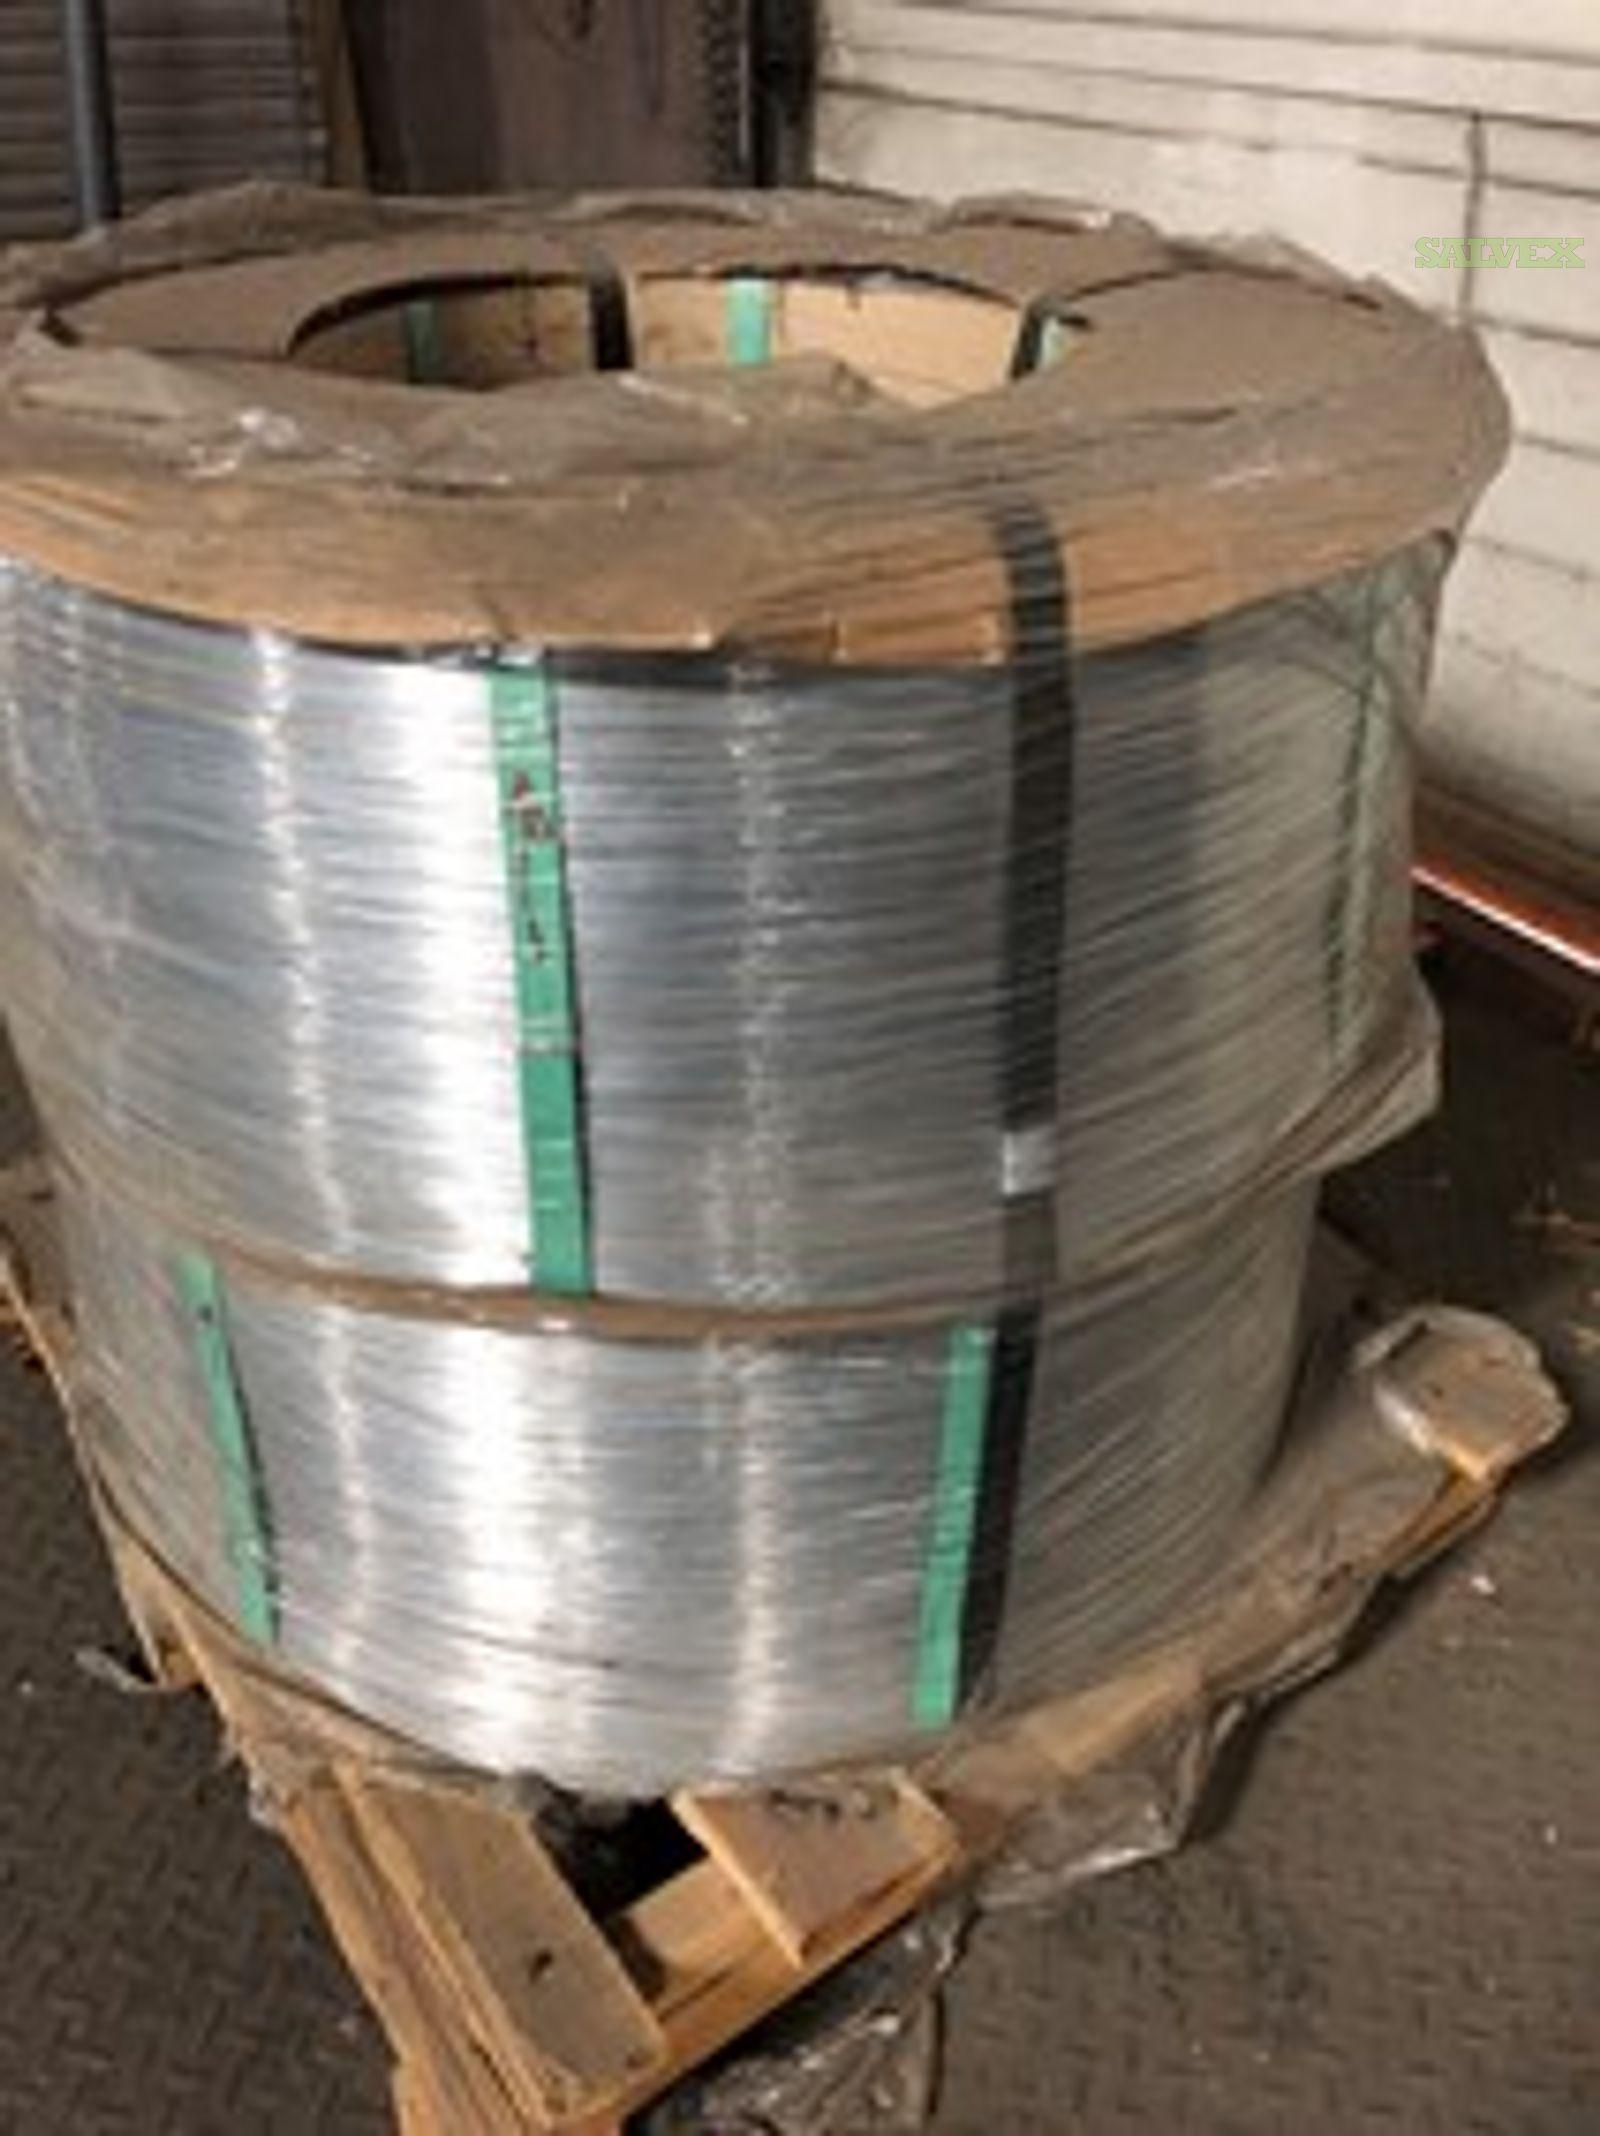 Galvanized High Carbon Steel Wire 0.018'' / 0.45mm (60 Rolls / 30,000 Lbs)